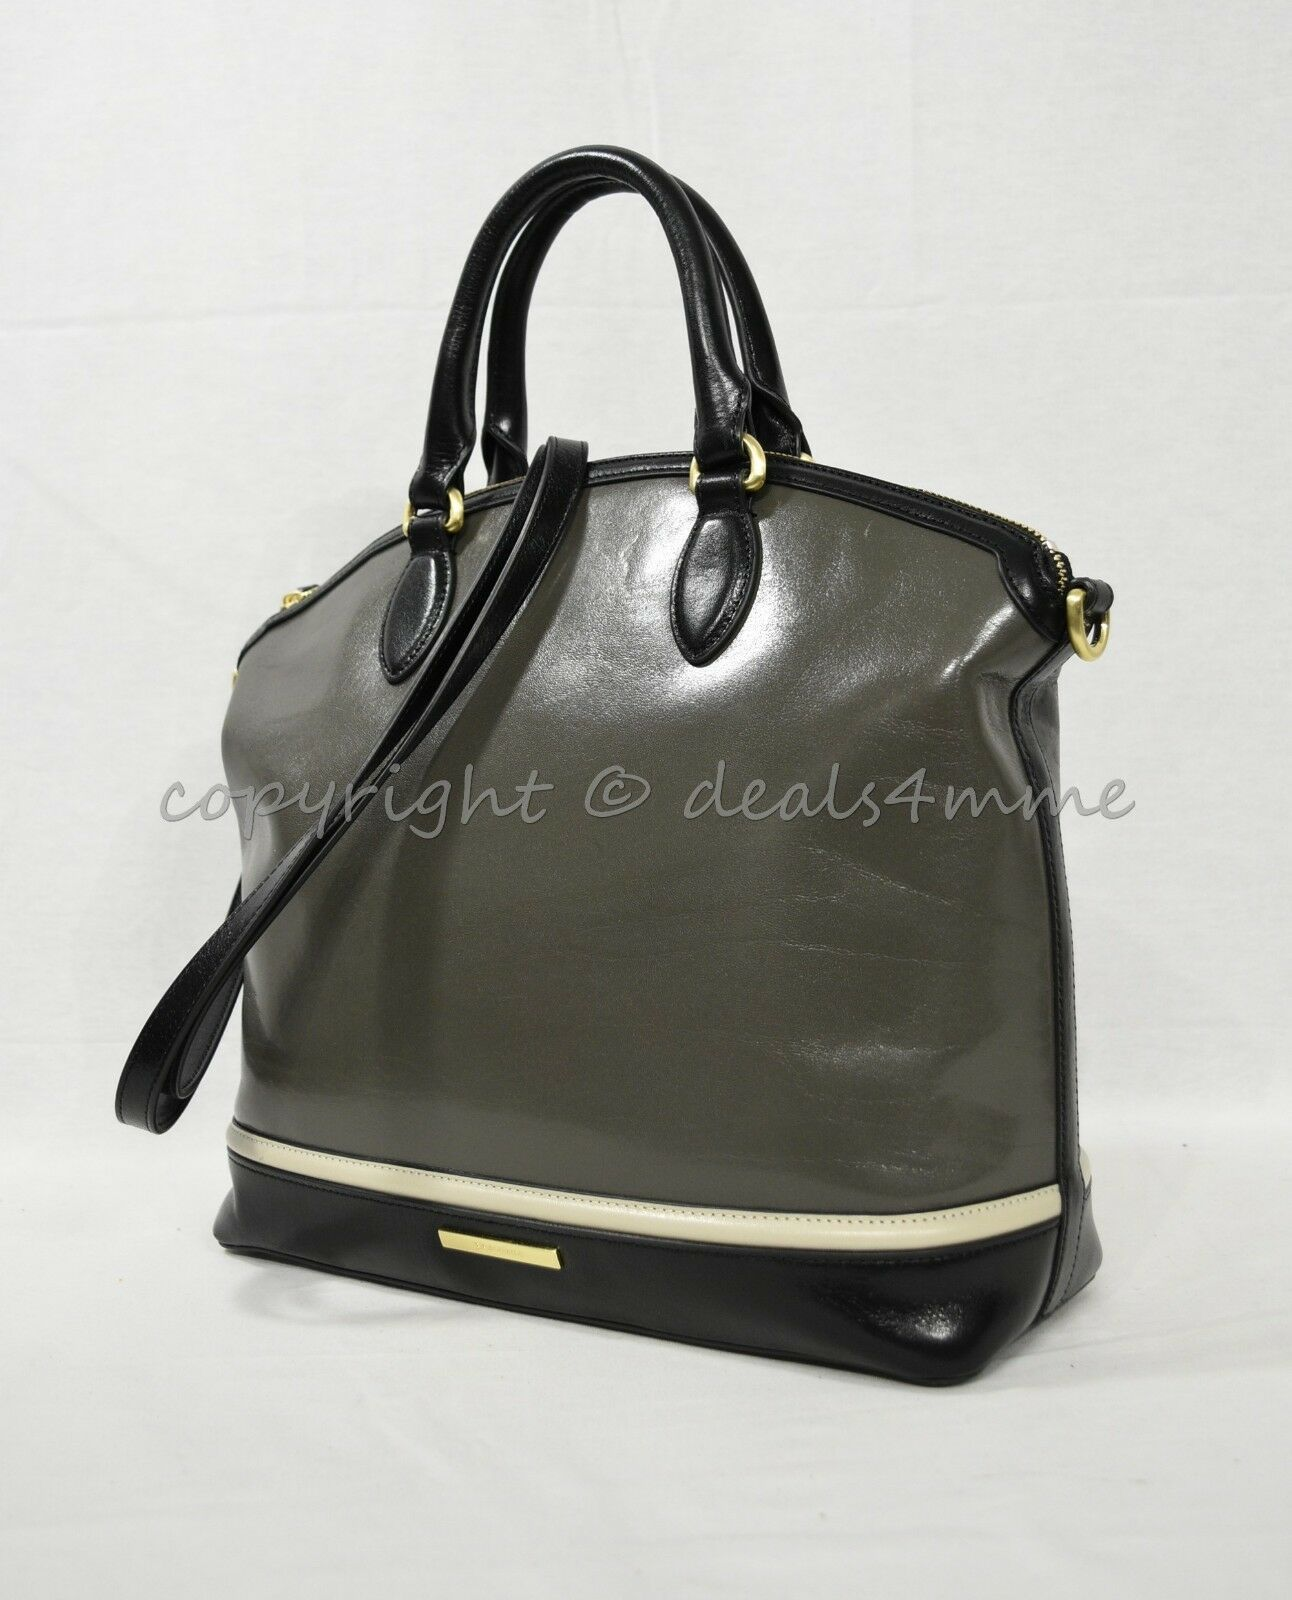 NWD Brahmin Large Duxbury Satchel/Shoulder Bag in Charcoal Westport image 2